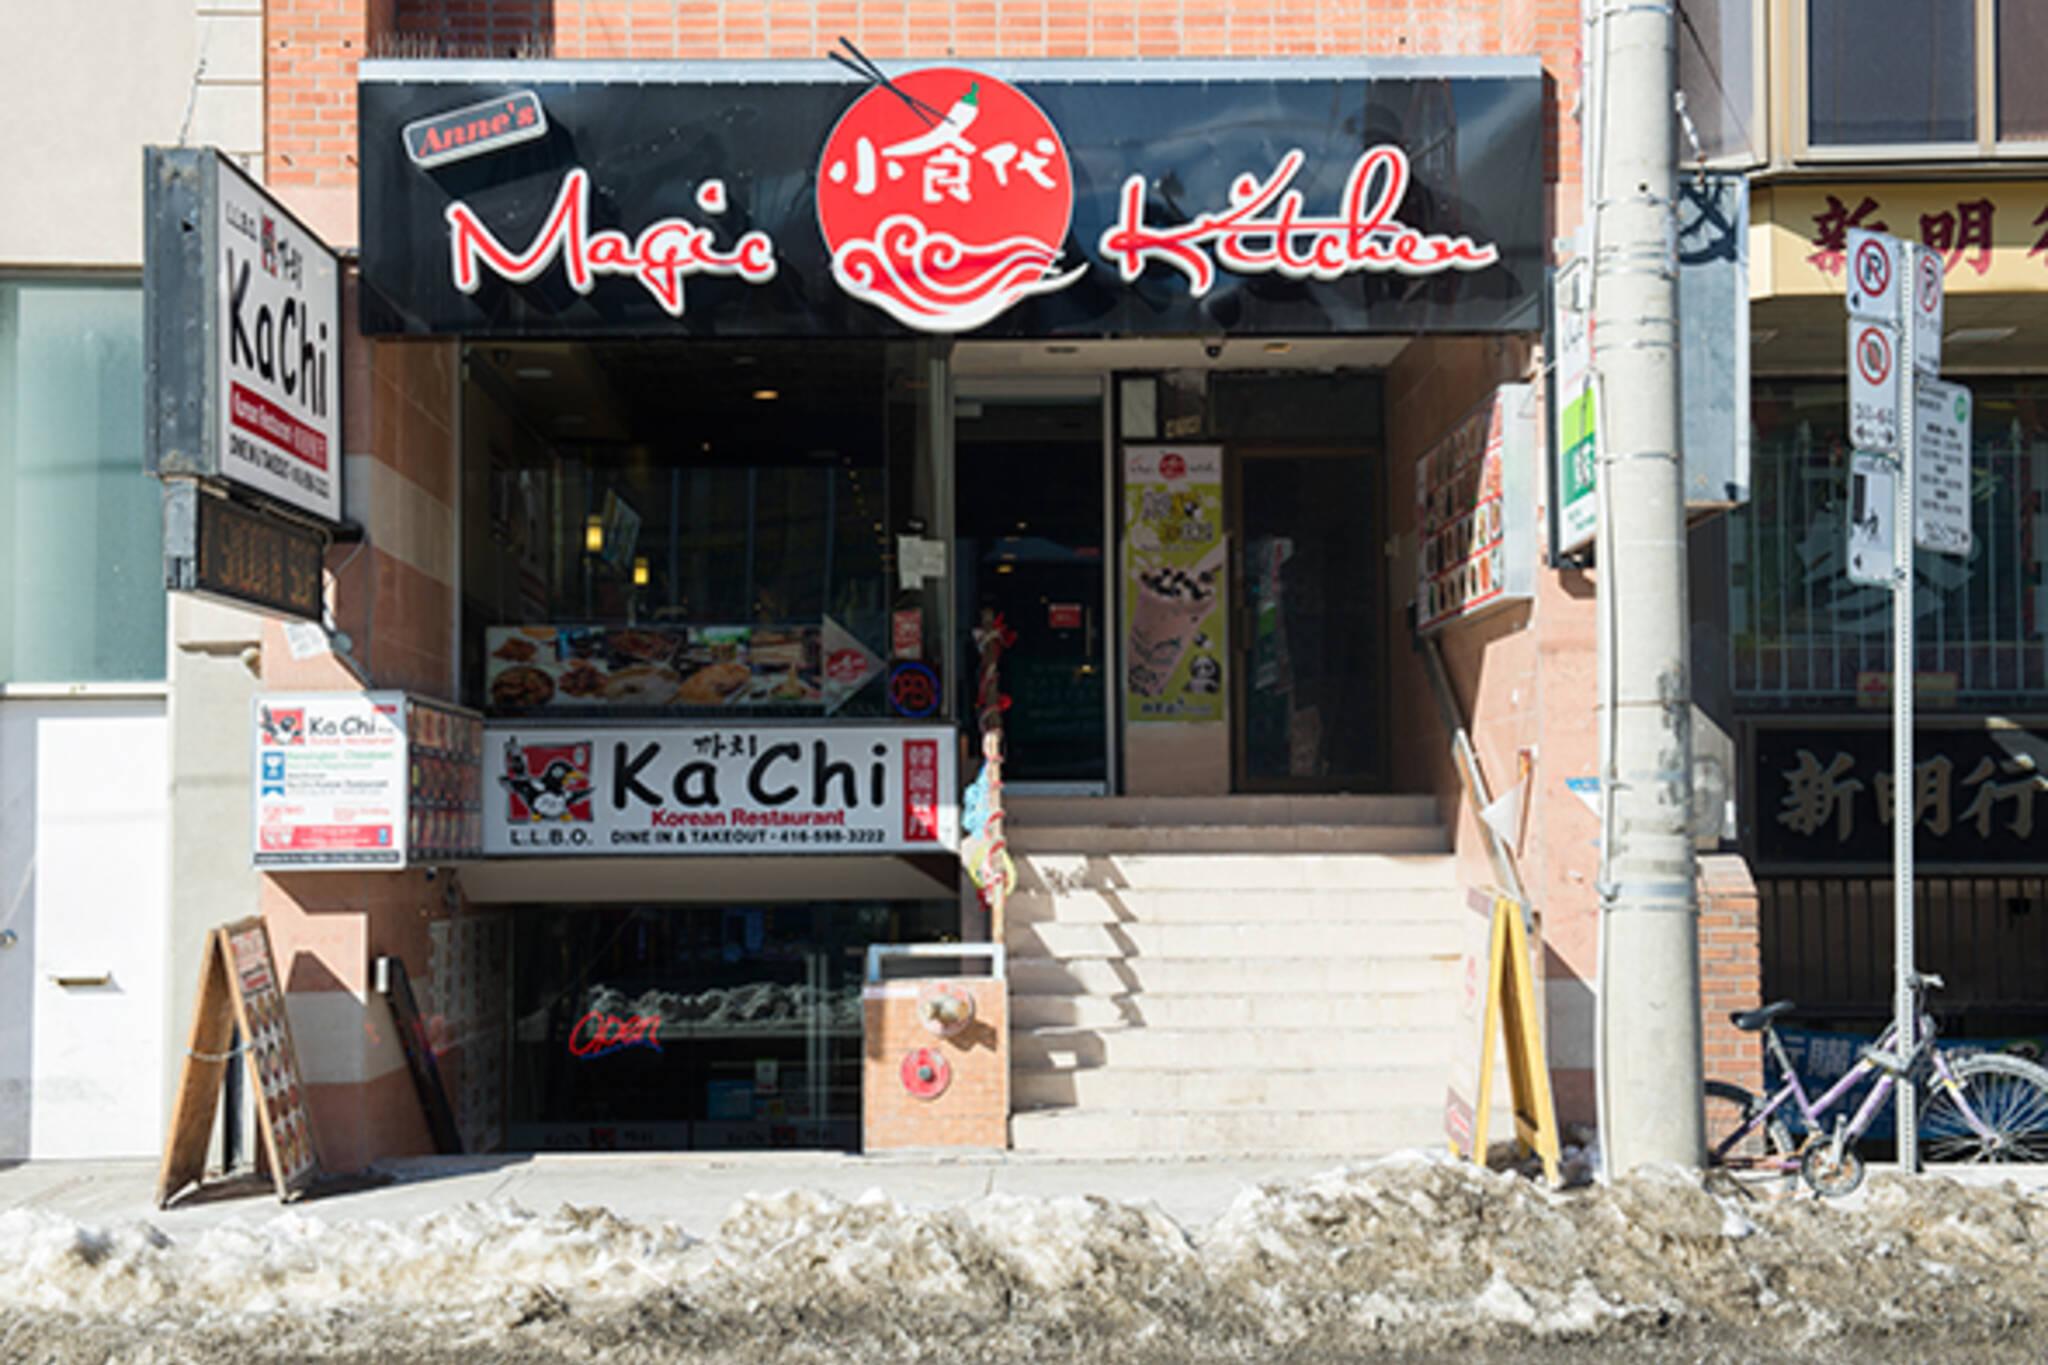 Magic Kitchen - CLOSED - blogTO - Toronto